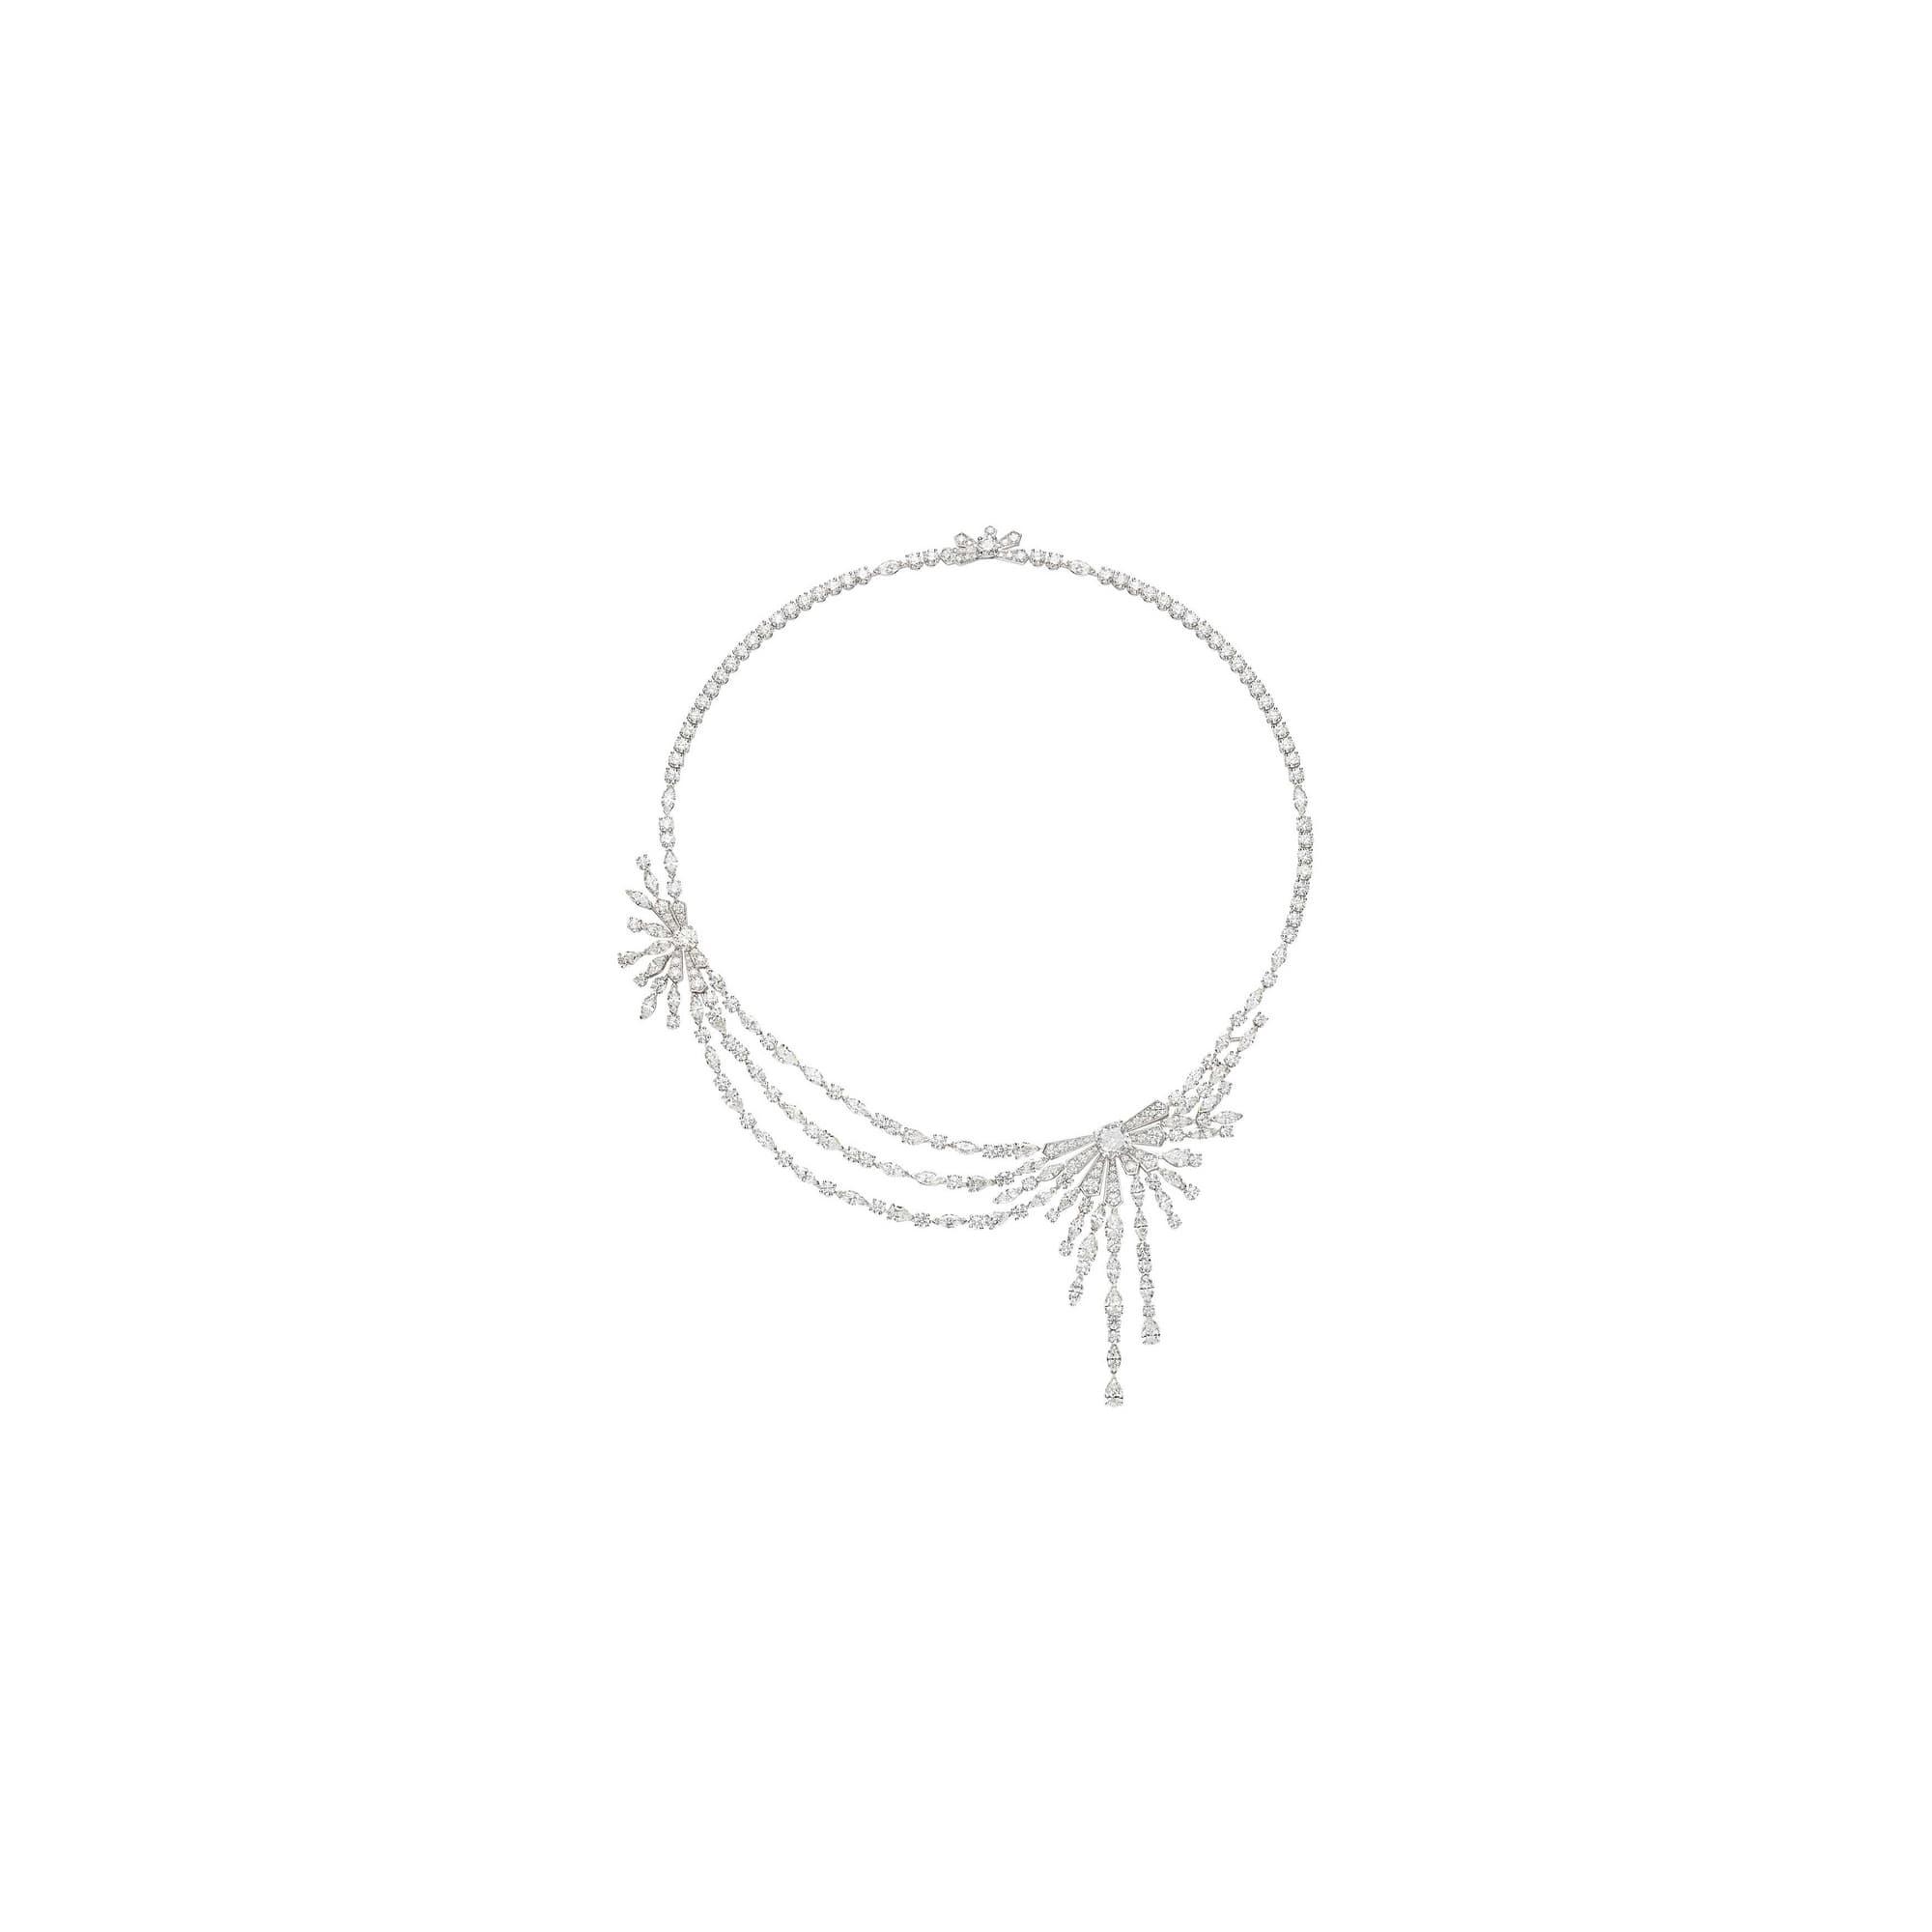 SUNLIGHT ESCAPE系列钻石项链